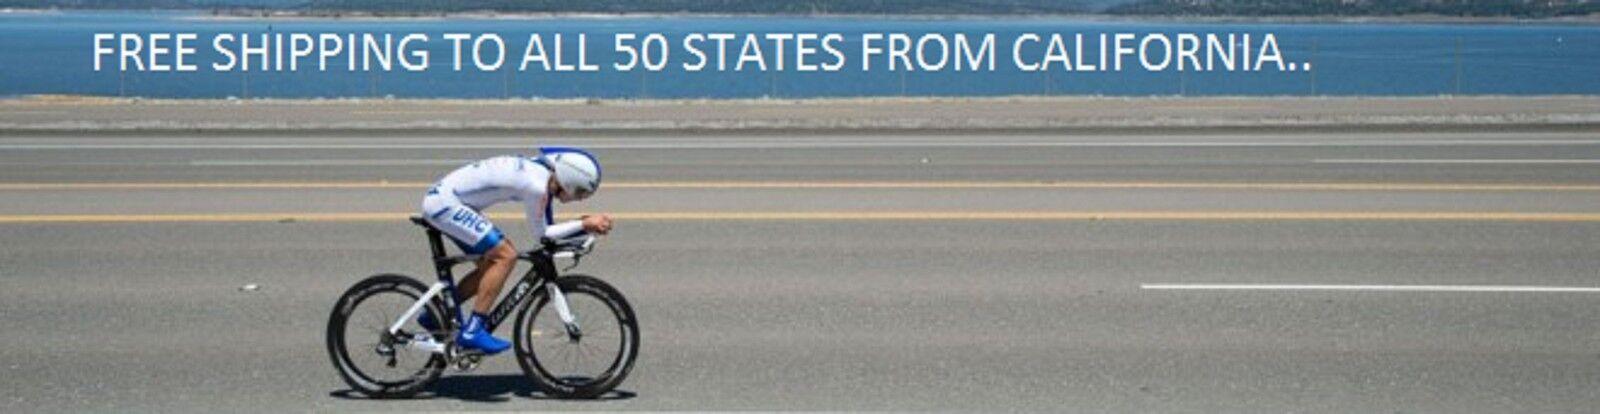 o_cyclism_o Bike Parts Online Store